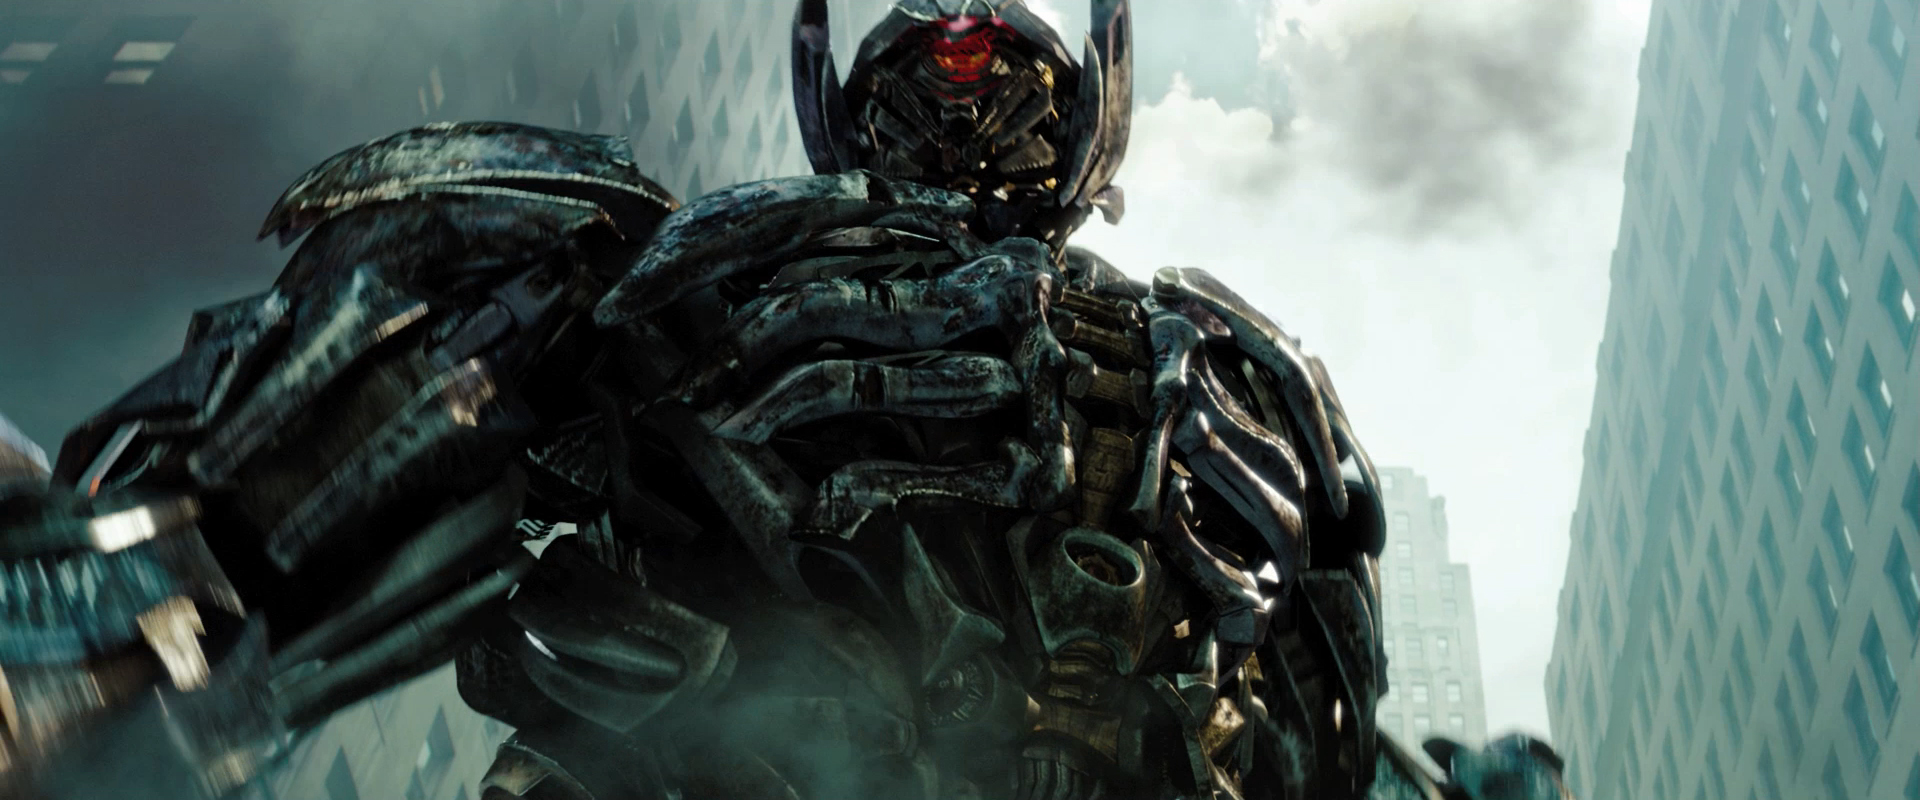 Transformers 3 - Soundwave - HeyUGuys